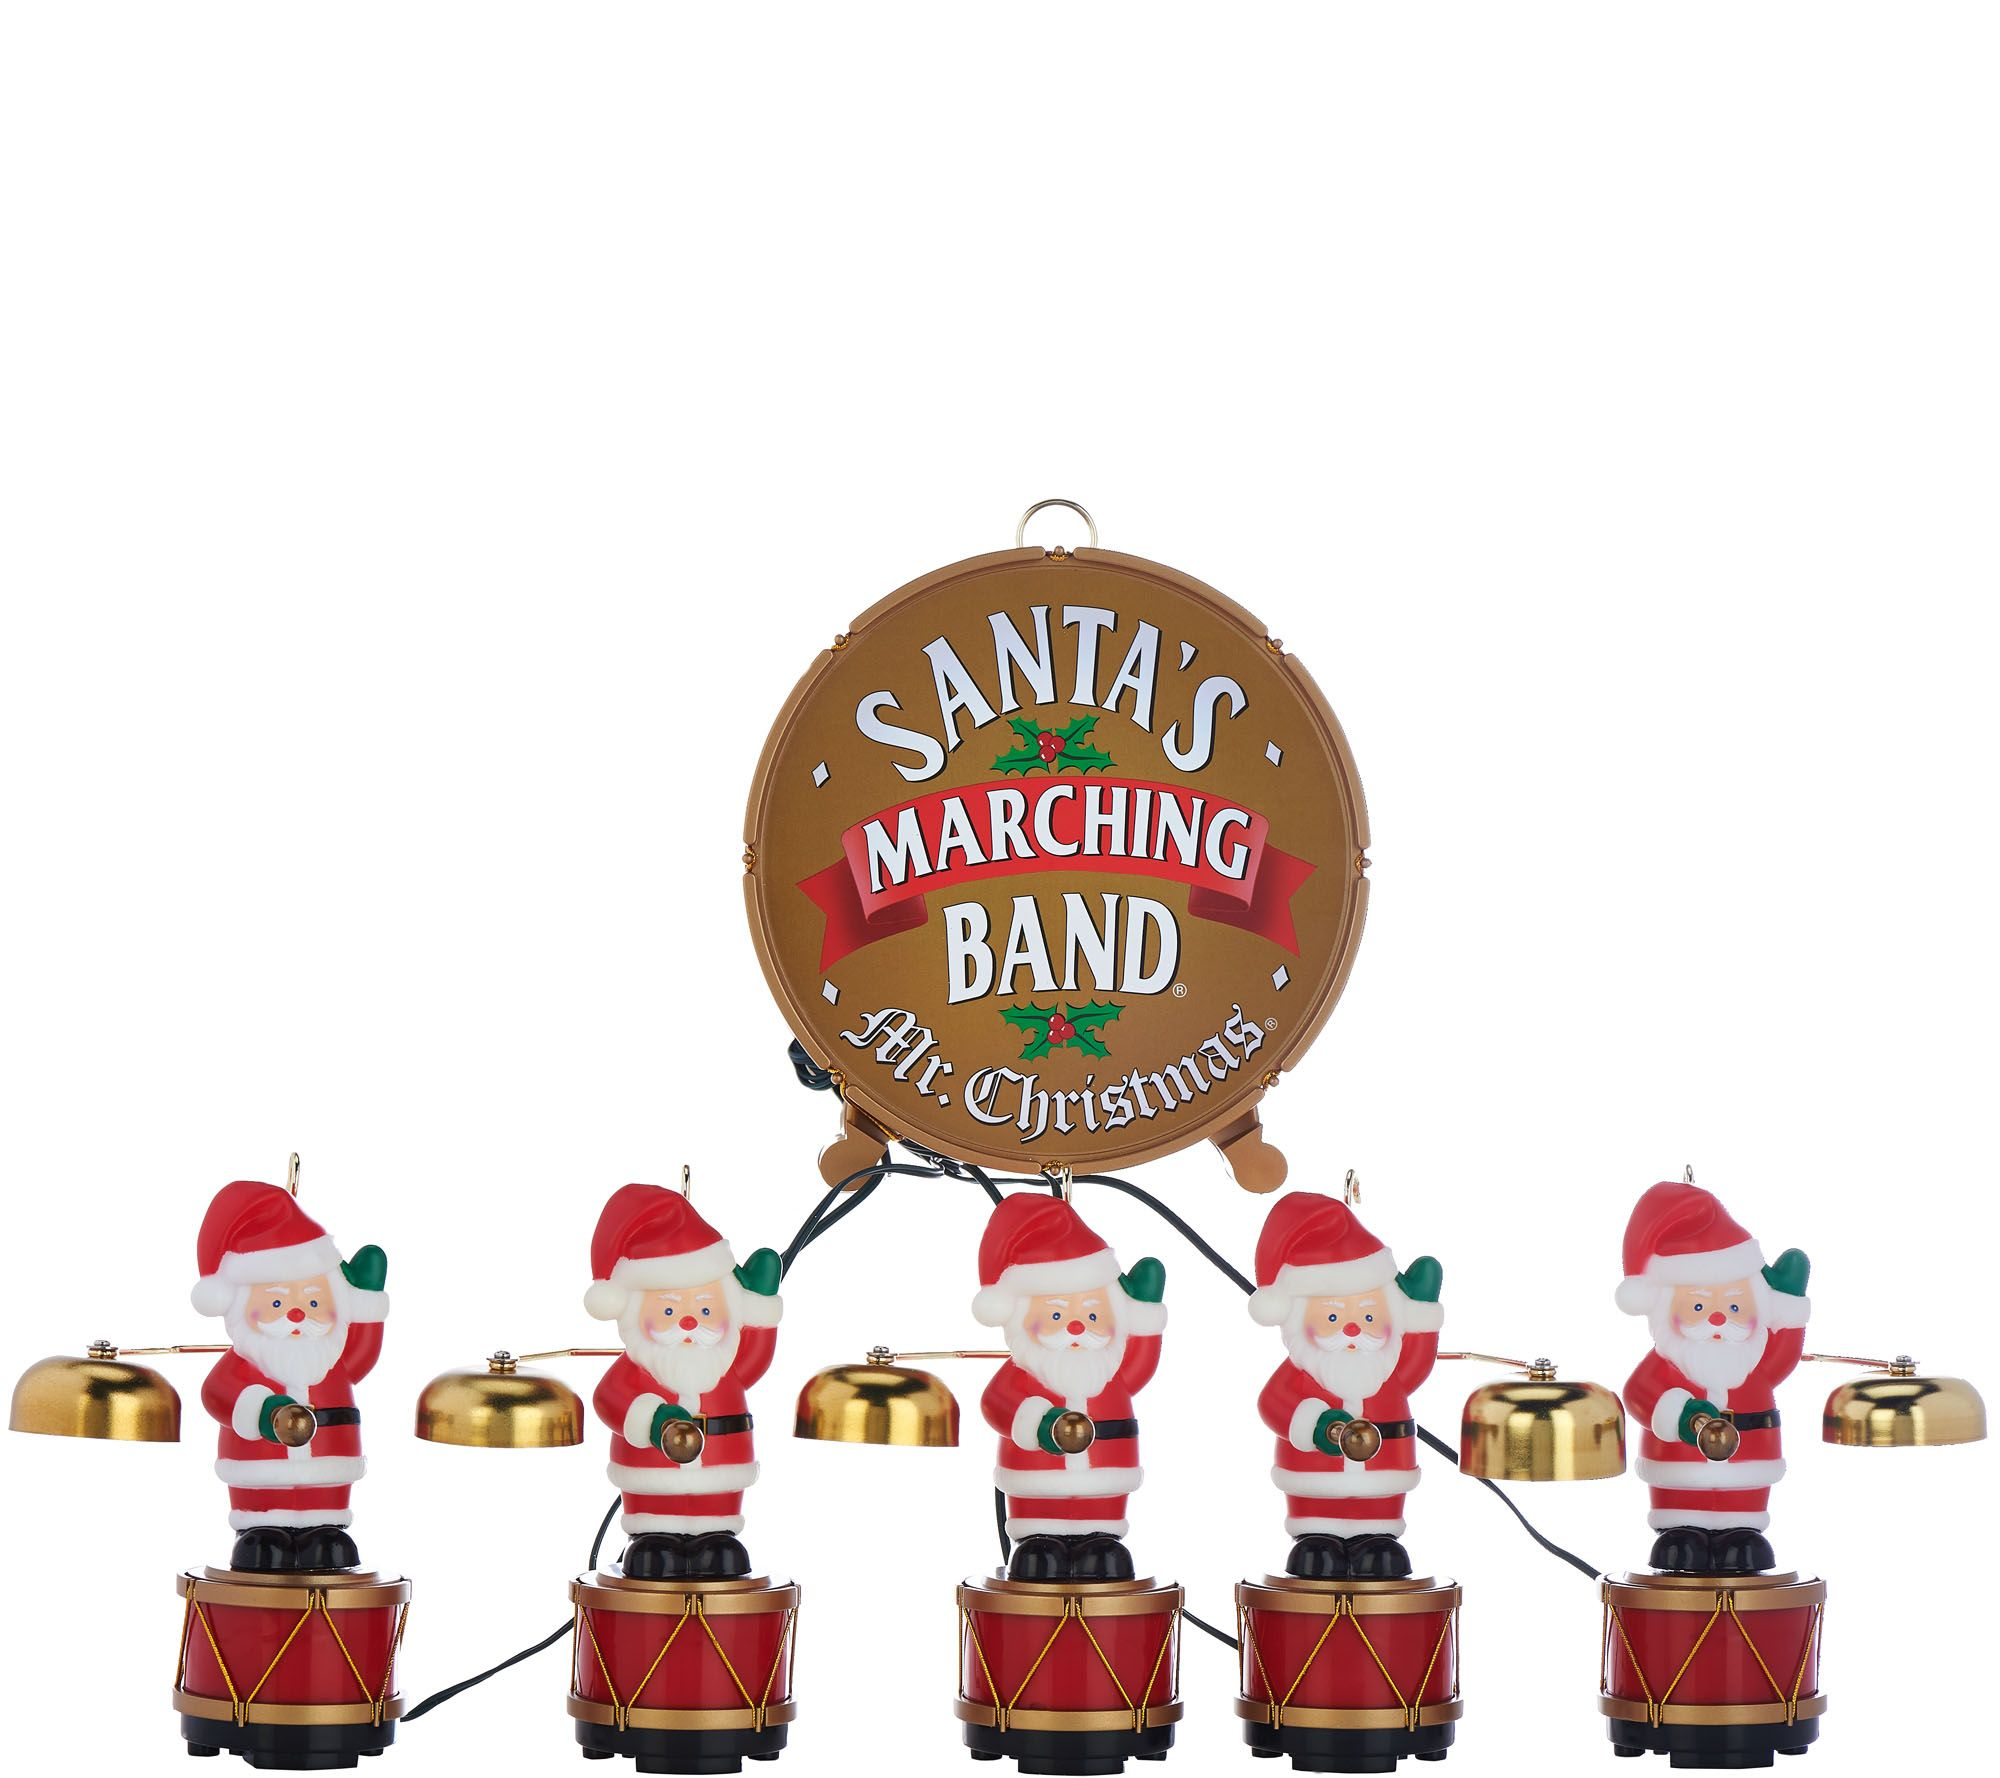 Mr. Christmas 25th Anniversary Santa's Marching Band - Page 1 ...